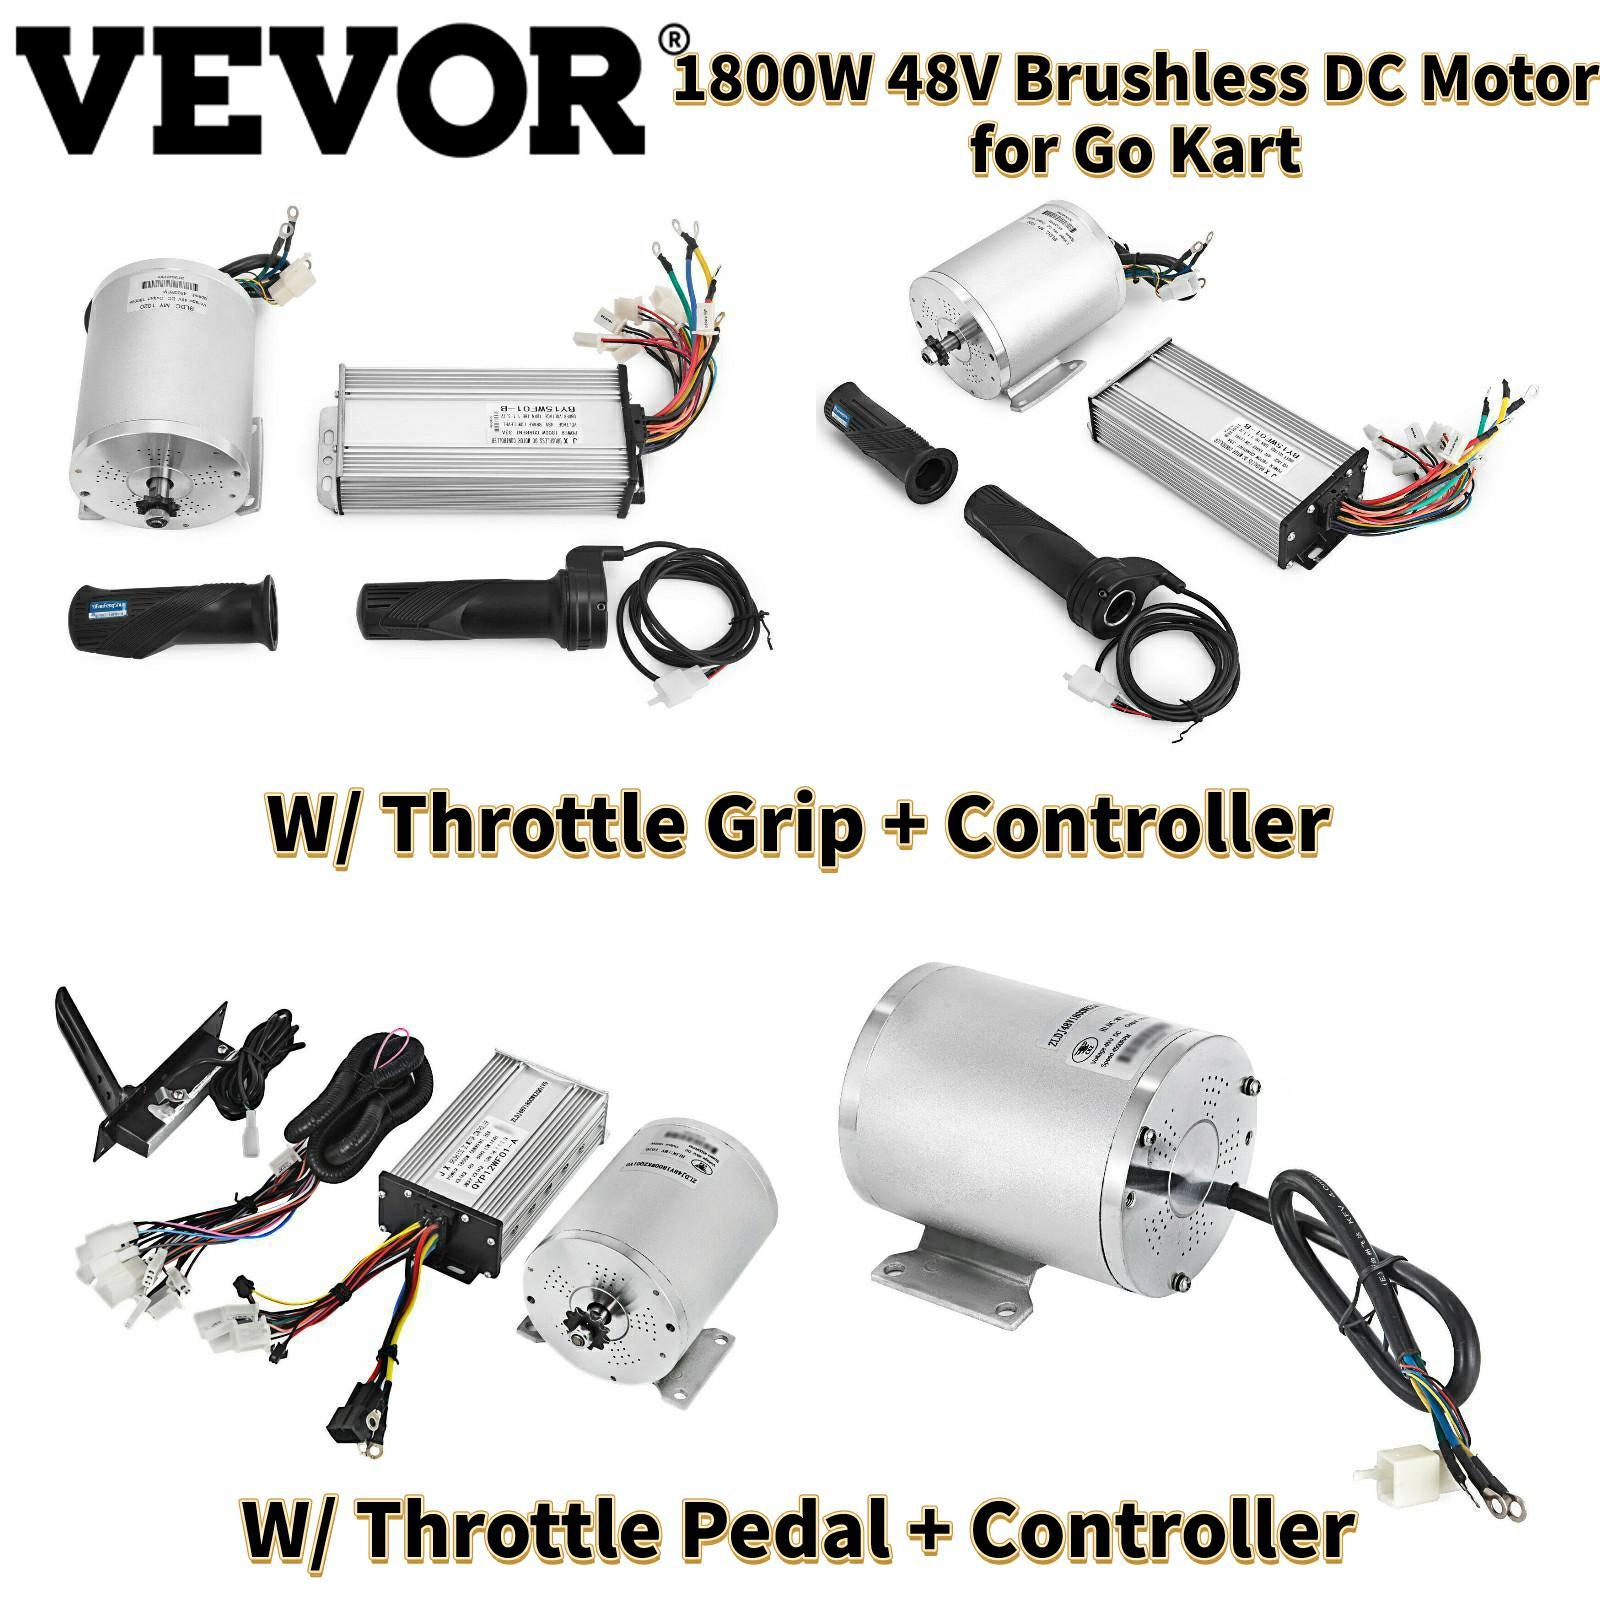 VEVOR محرك تيار مستمر كهربائي دون فرشاة مع سرعة تحكم و خنق قبضة/دواسة 48 فولت 1800 واط 4500 دورة في الدقيقة ل E-سكوتر Go-Karts E-Bike